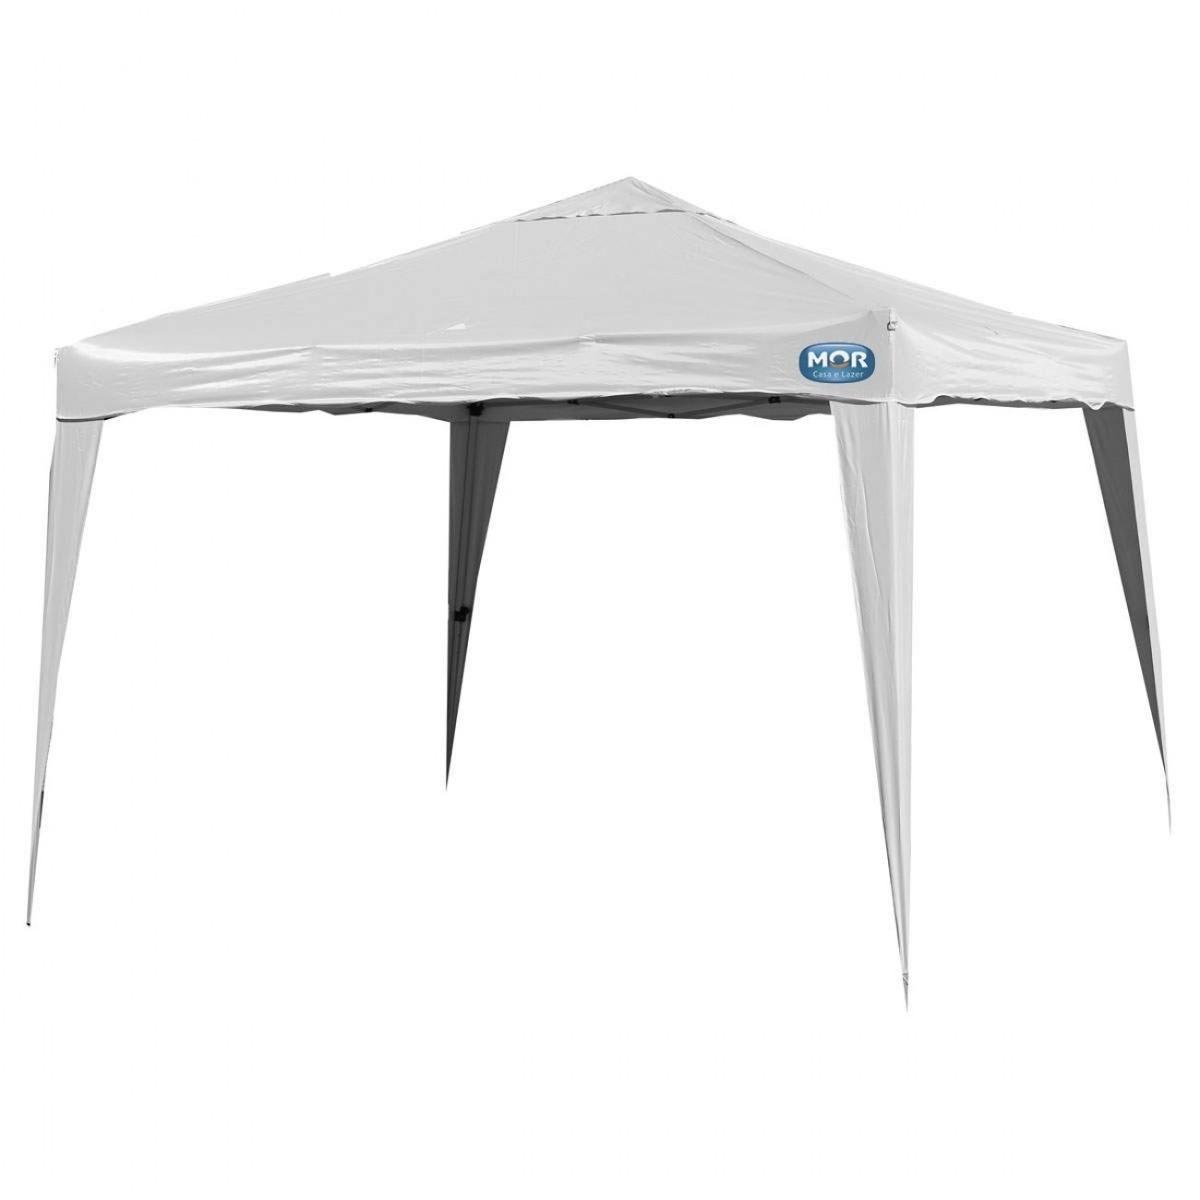 tenda gazebo x-flex dobravel articulada 3x3 mts branca mor. Carregando zoom. 6dac3bb0a6